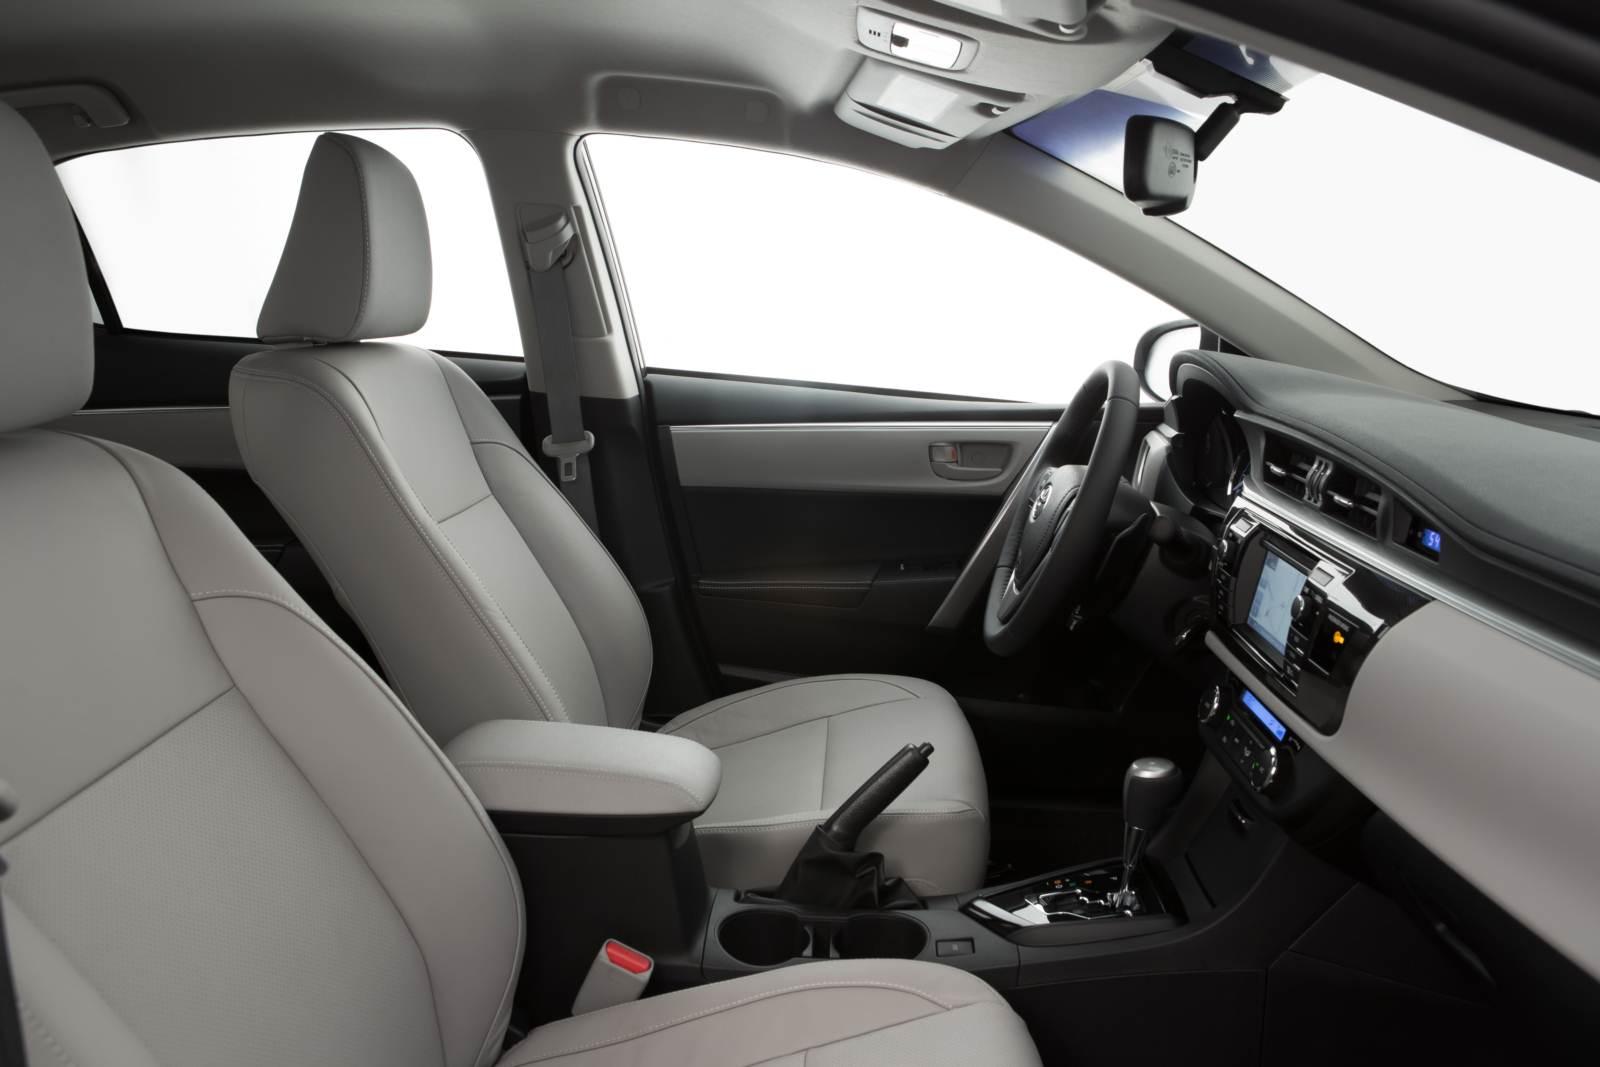 2012 Interior Toyota Fielder Corolla